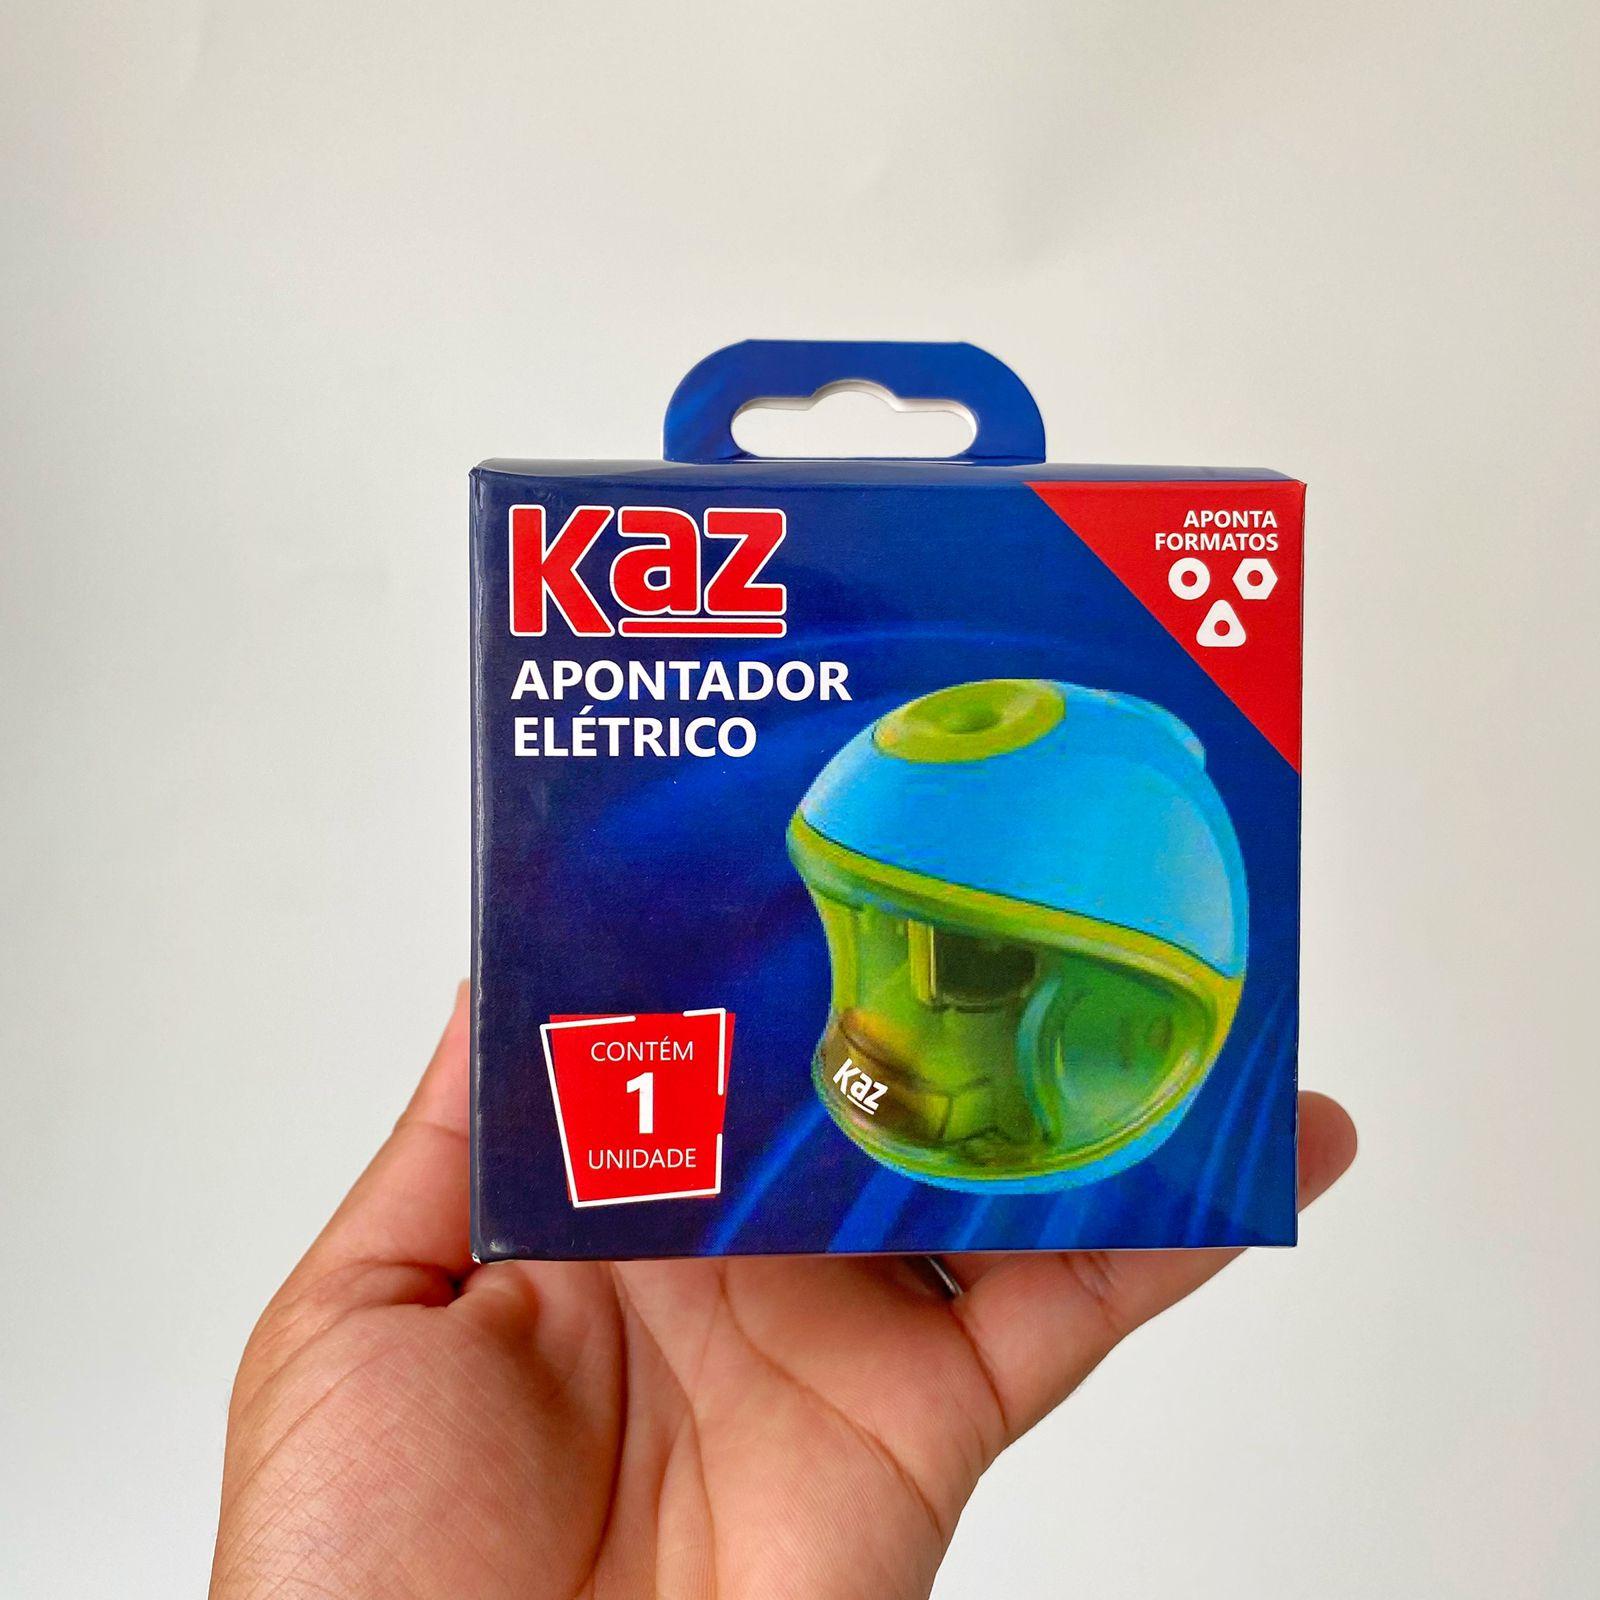 Apontador Elétrico de Mesa Capacete   Kaz